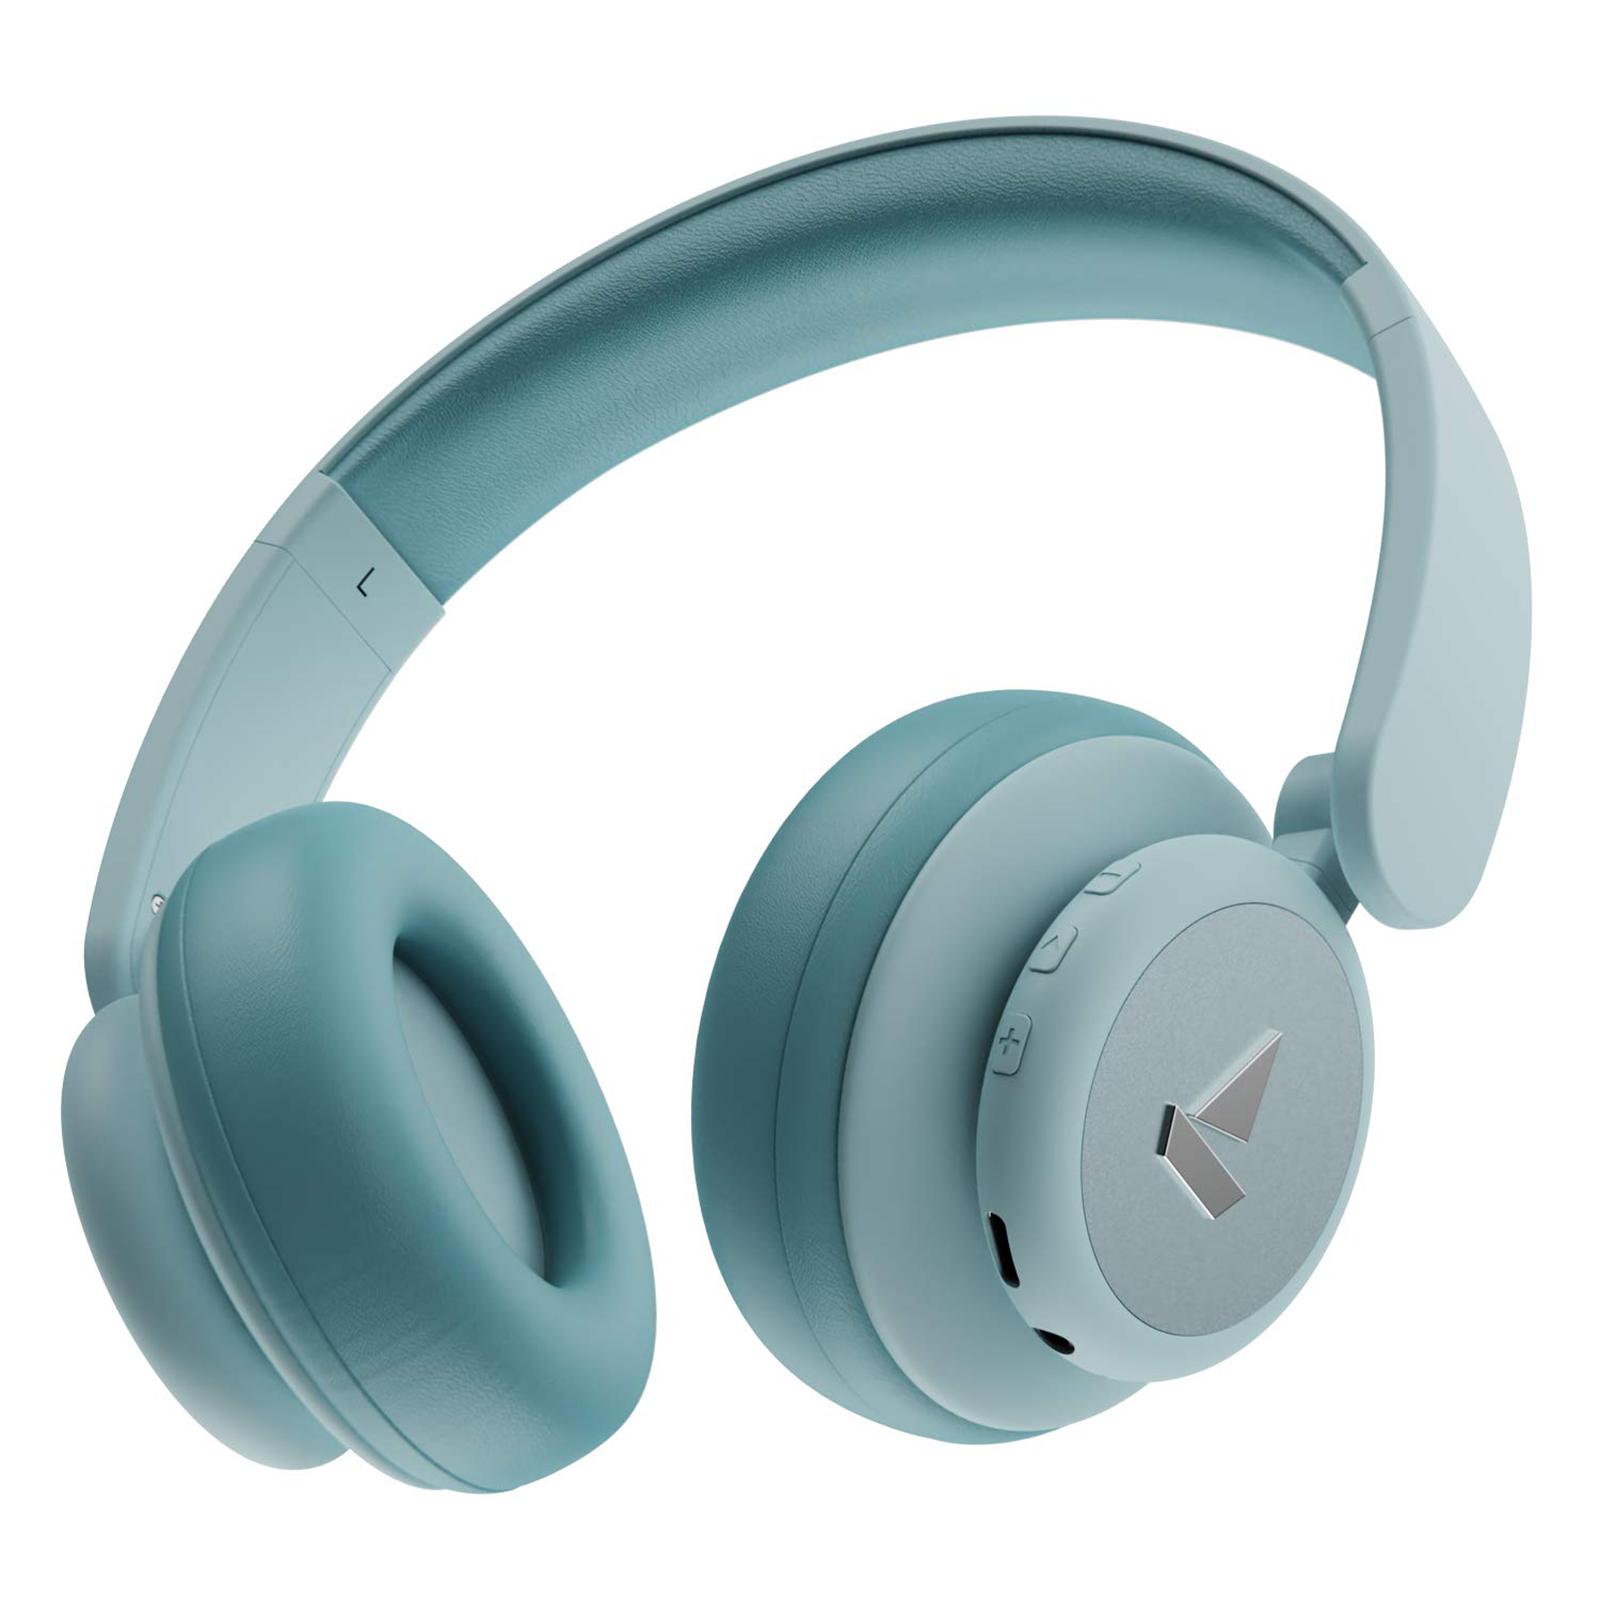 boAt On-Ear Wireless Headphone with Mic (Bluetooth 5.0, Rockerz 450 Pro, Aqua Blue)_1